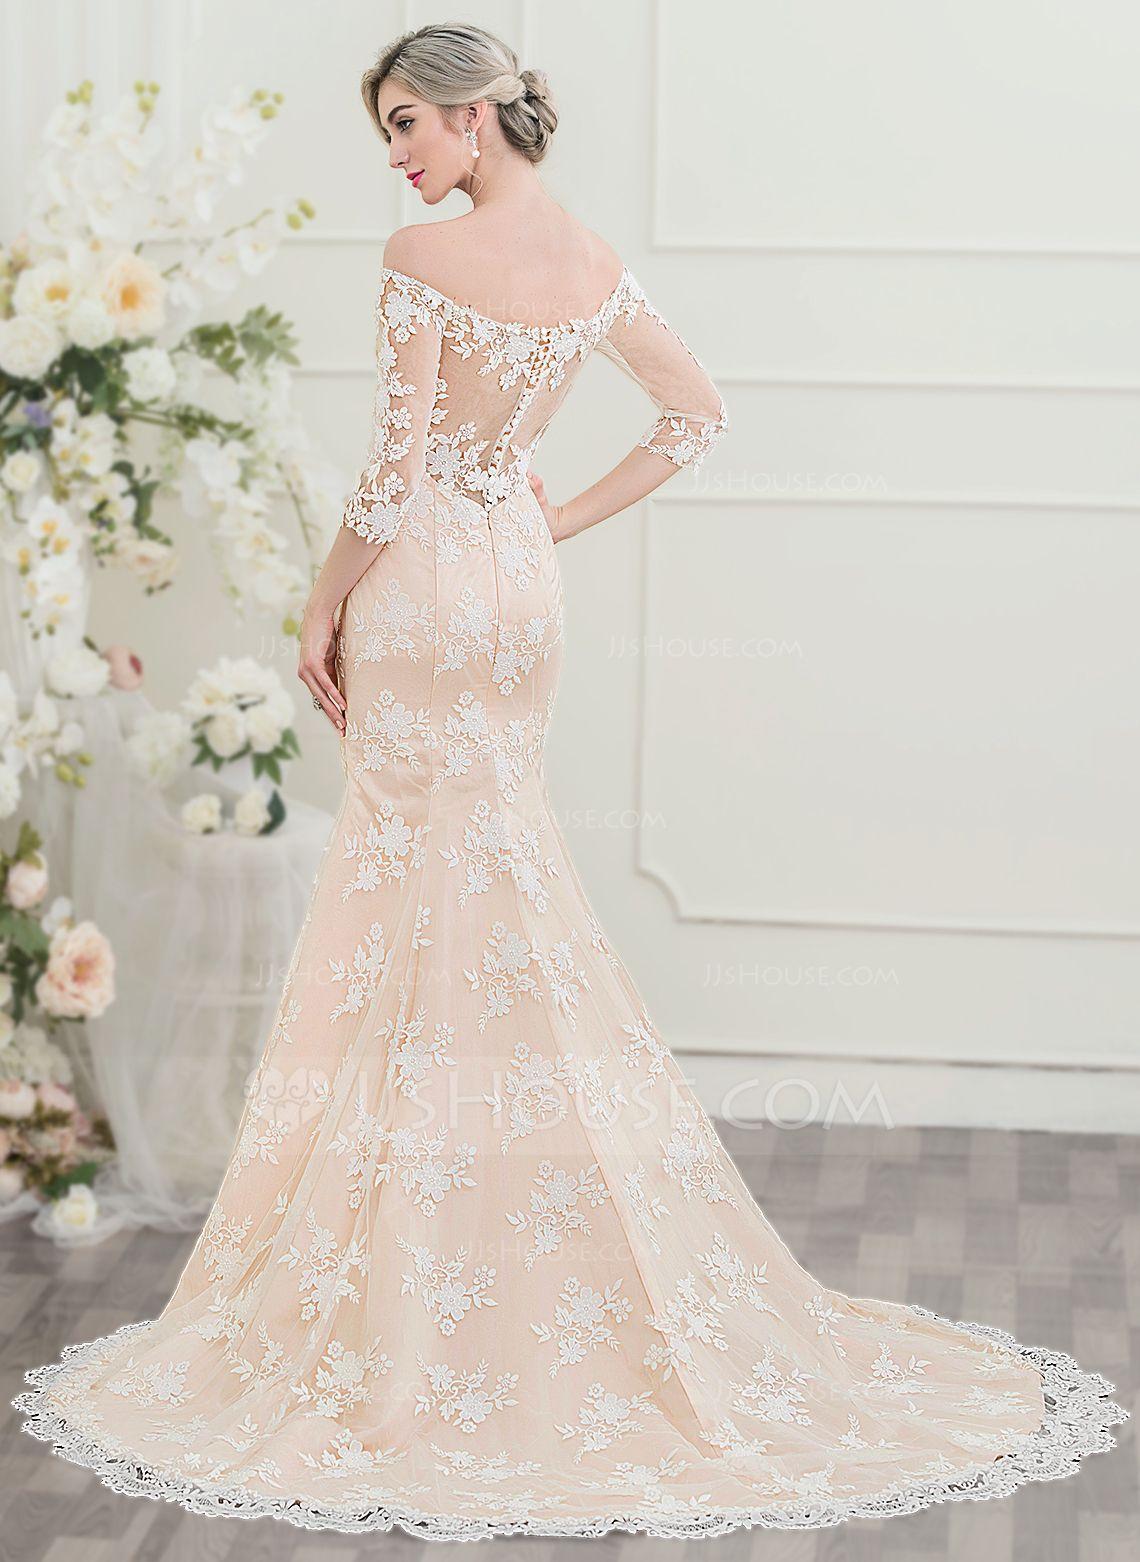 Us 312 00 Trumpet Mermaid Off The Shoulder Court Train Lace Wedding Dress Jj S House Wedding Dresses Wedding Dresses Lace Wedding Gowns Lace [ 1562 x 1140 Pixel ]